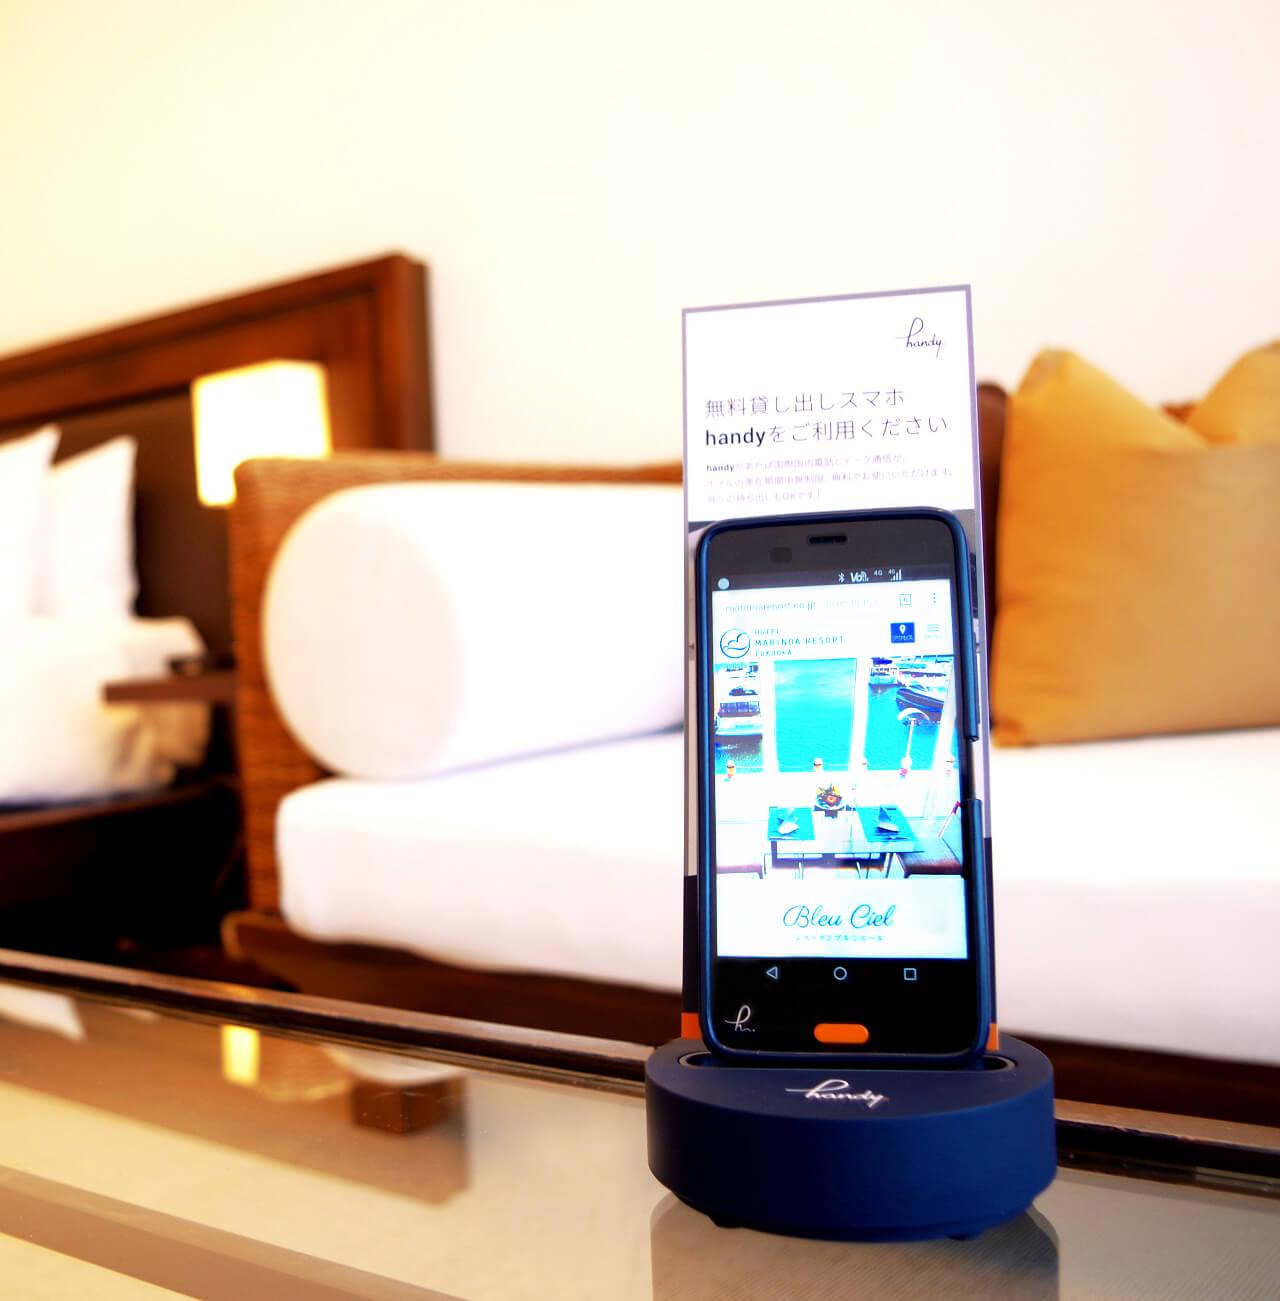 Handy phone